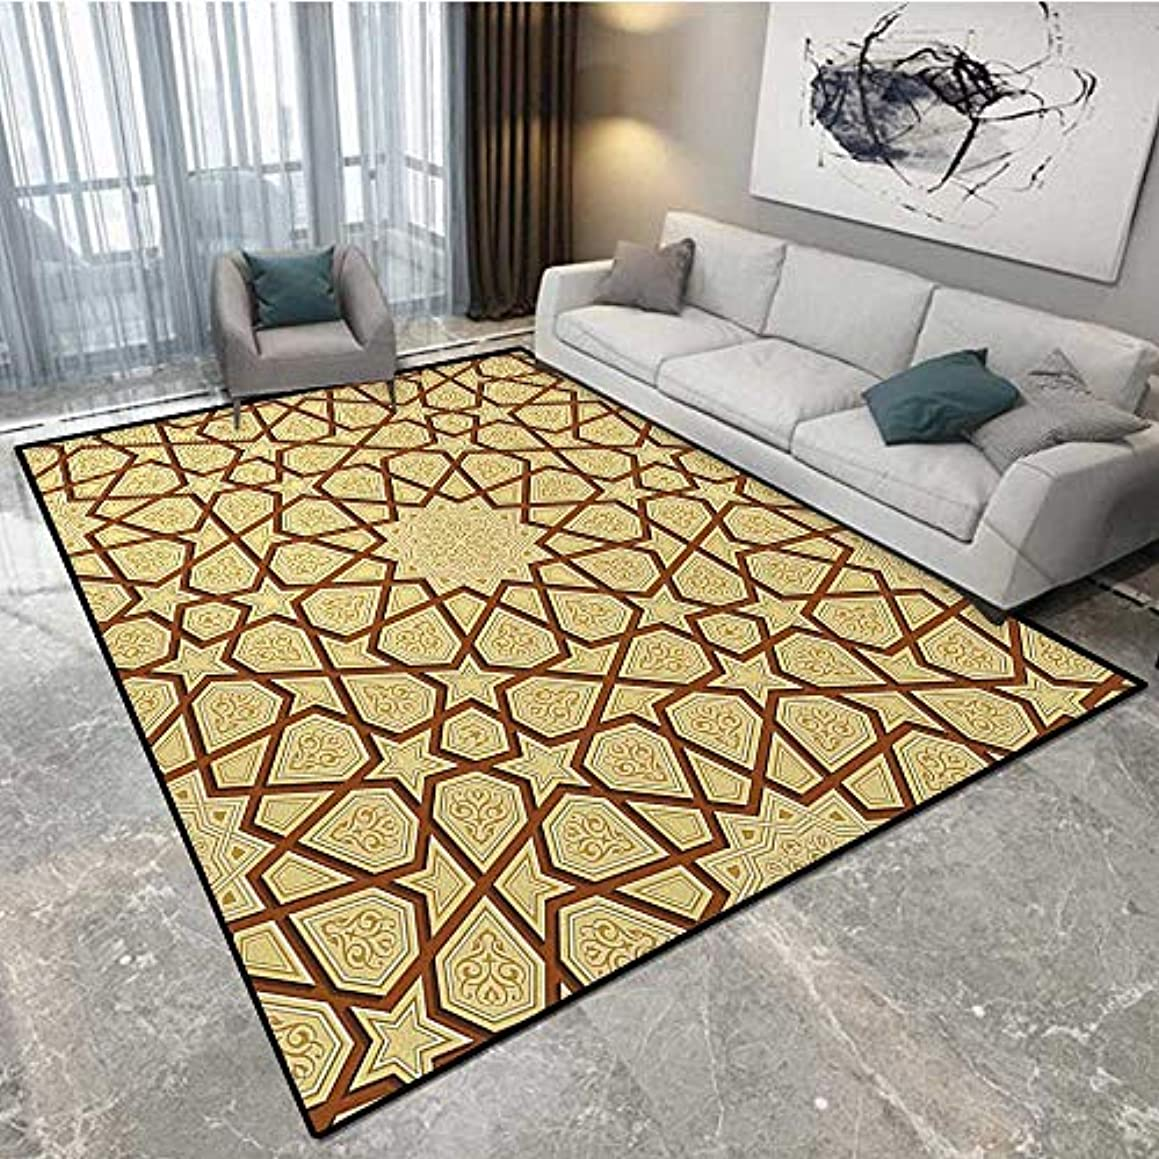 Antique Mini Carpet Cleaner Arabesque Star Shapes on Retro Design with Fractures Classic Eastern Building Carpet Runners Non-Skid 5'x7' (W150cm x L210cm Cream Brown